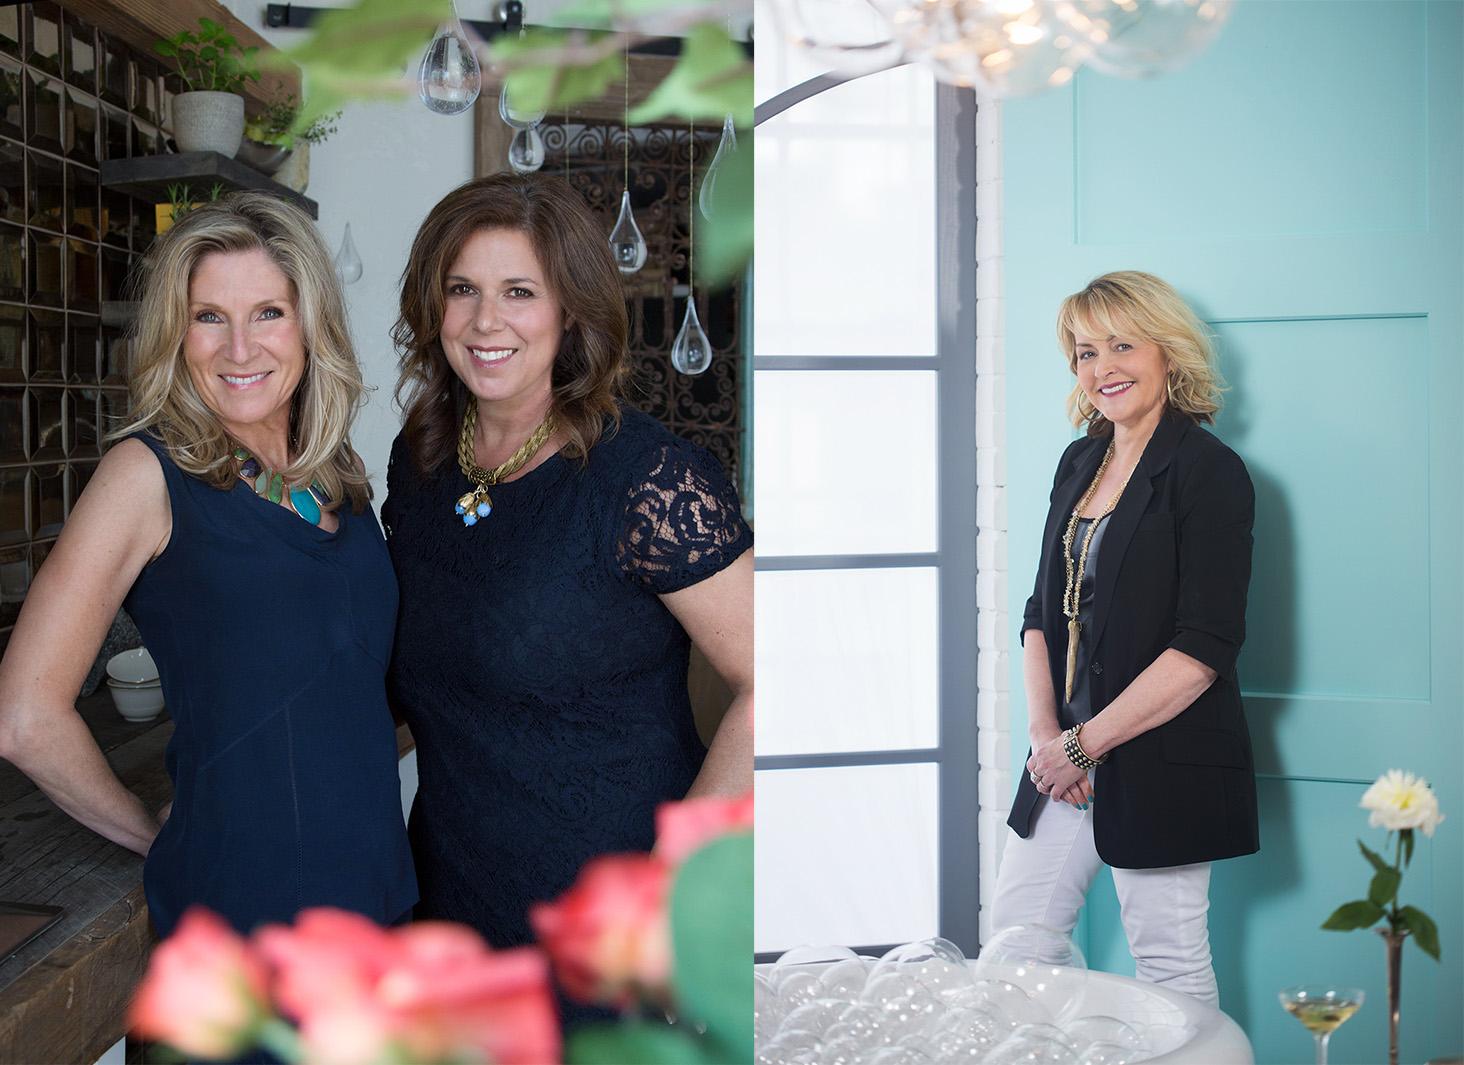 Lori Gilder/Rebecca Reynolds and Lisa Mende for the 2015 DXV Design Panel